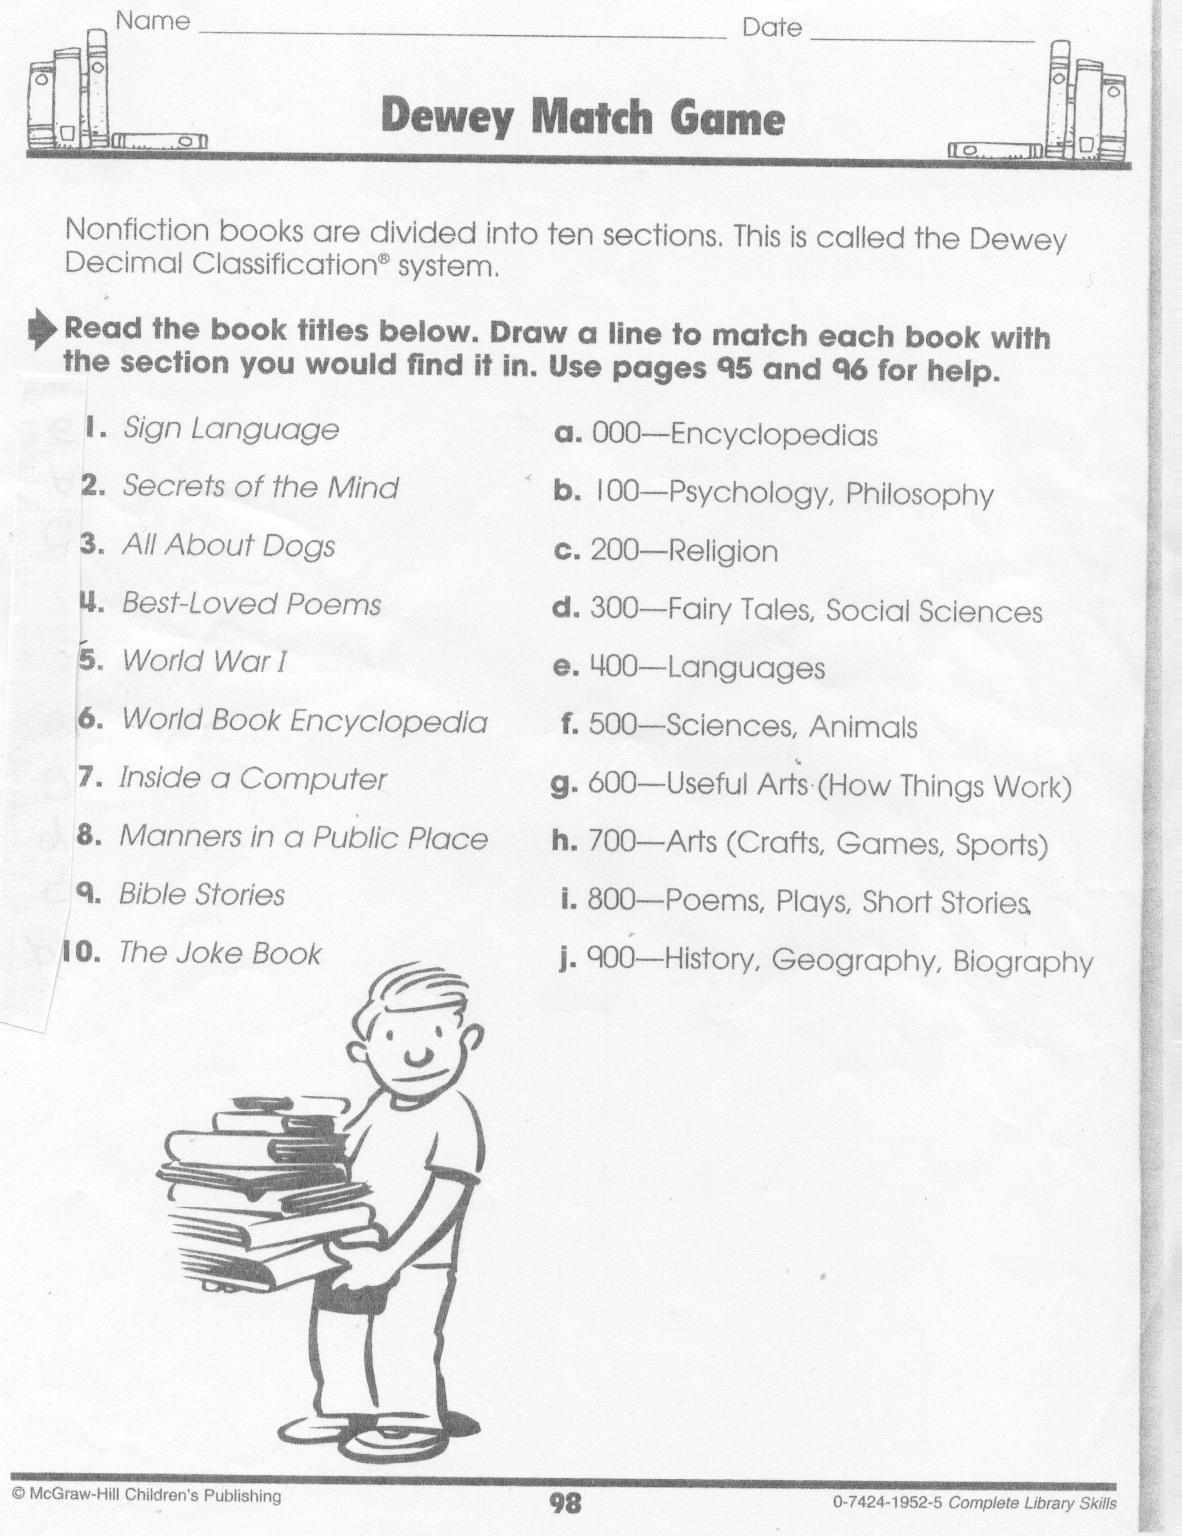 dewey decimal cheat sheet for kids - Google Search   Dewey decimal system [ 1536 x 1182 Pixel ]